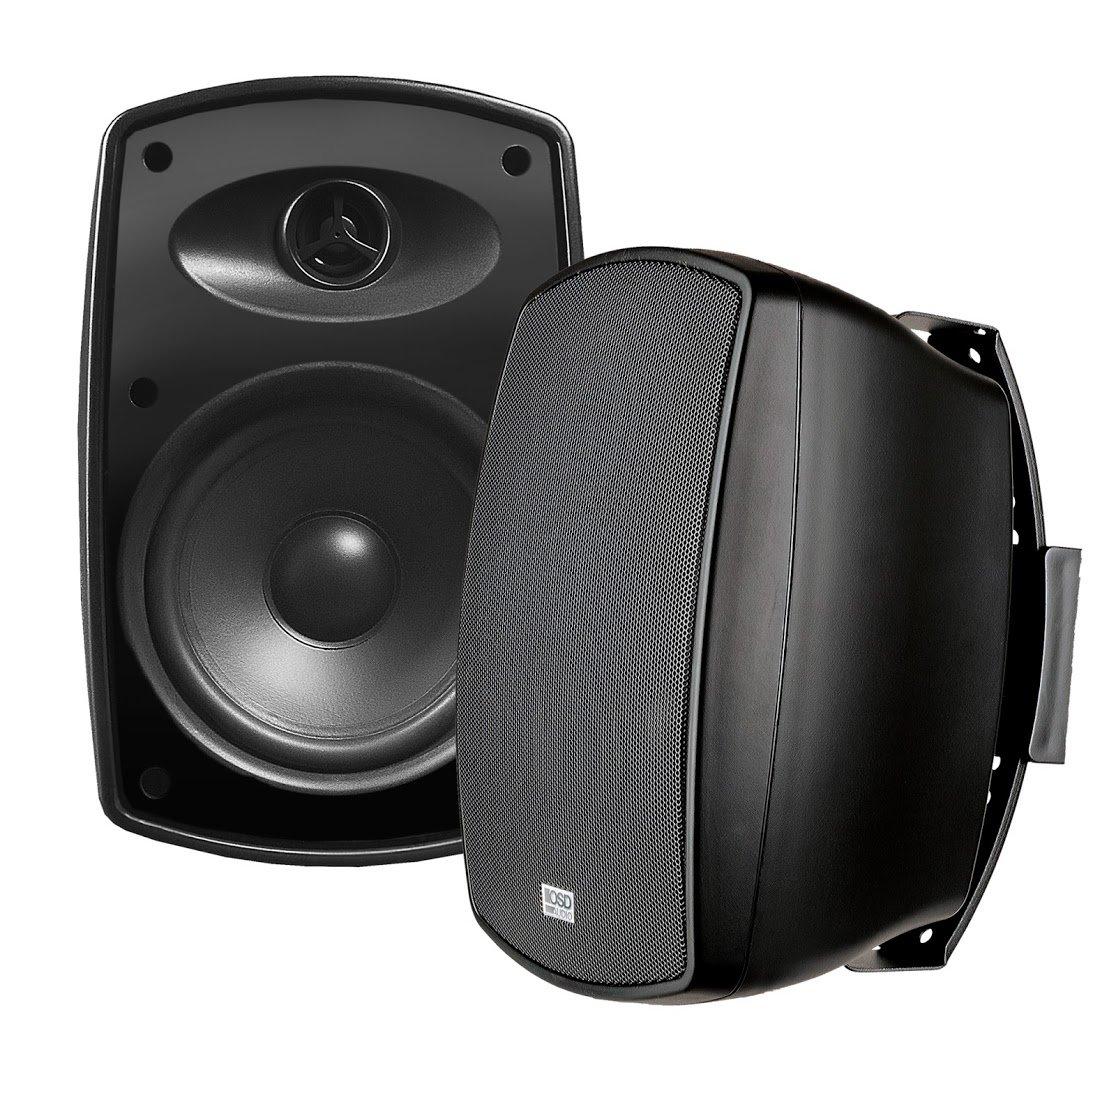 AP650 6.5-Inch 150W High Performance Composite Resin Low Resonator Cabinet 2-Way Indoor/Outdoor Weather-Resistant Patio Speakers - OSD Audio - (Pair, Black)